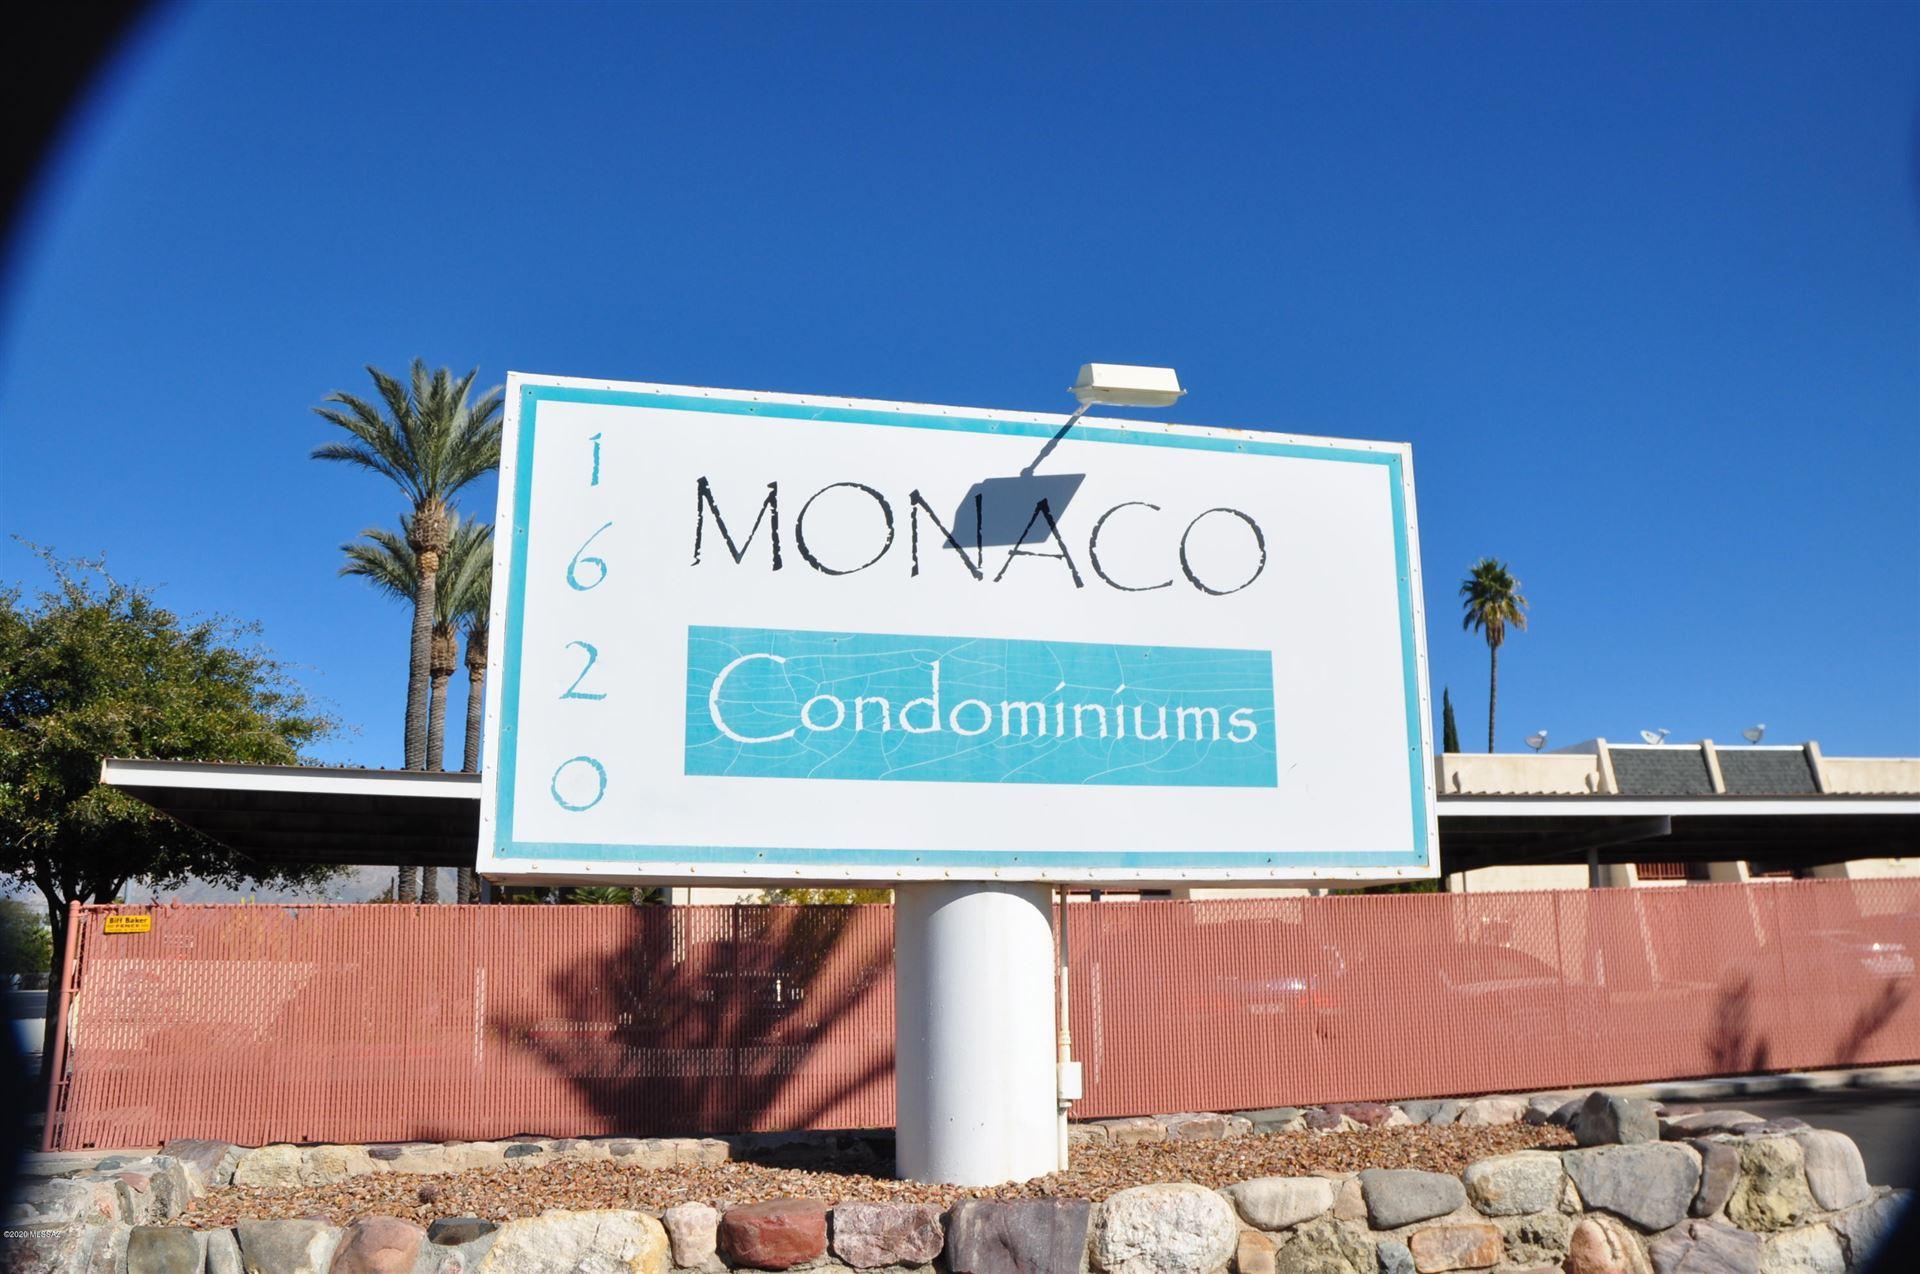 1620 N Wilmot Road #D266, Tucson, AZ 85712 - MLS#: 22005449